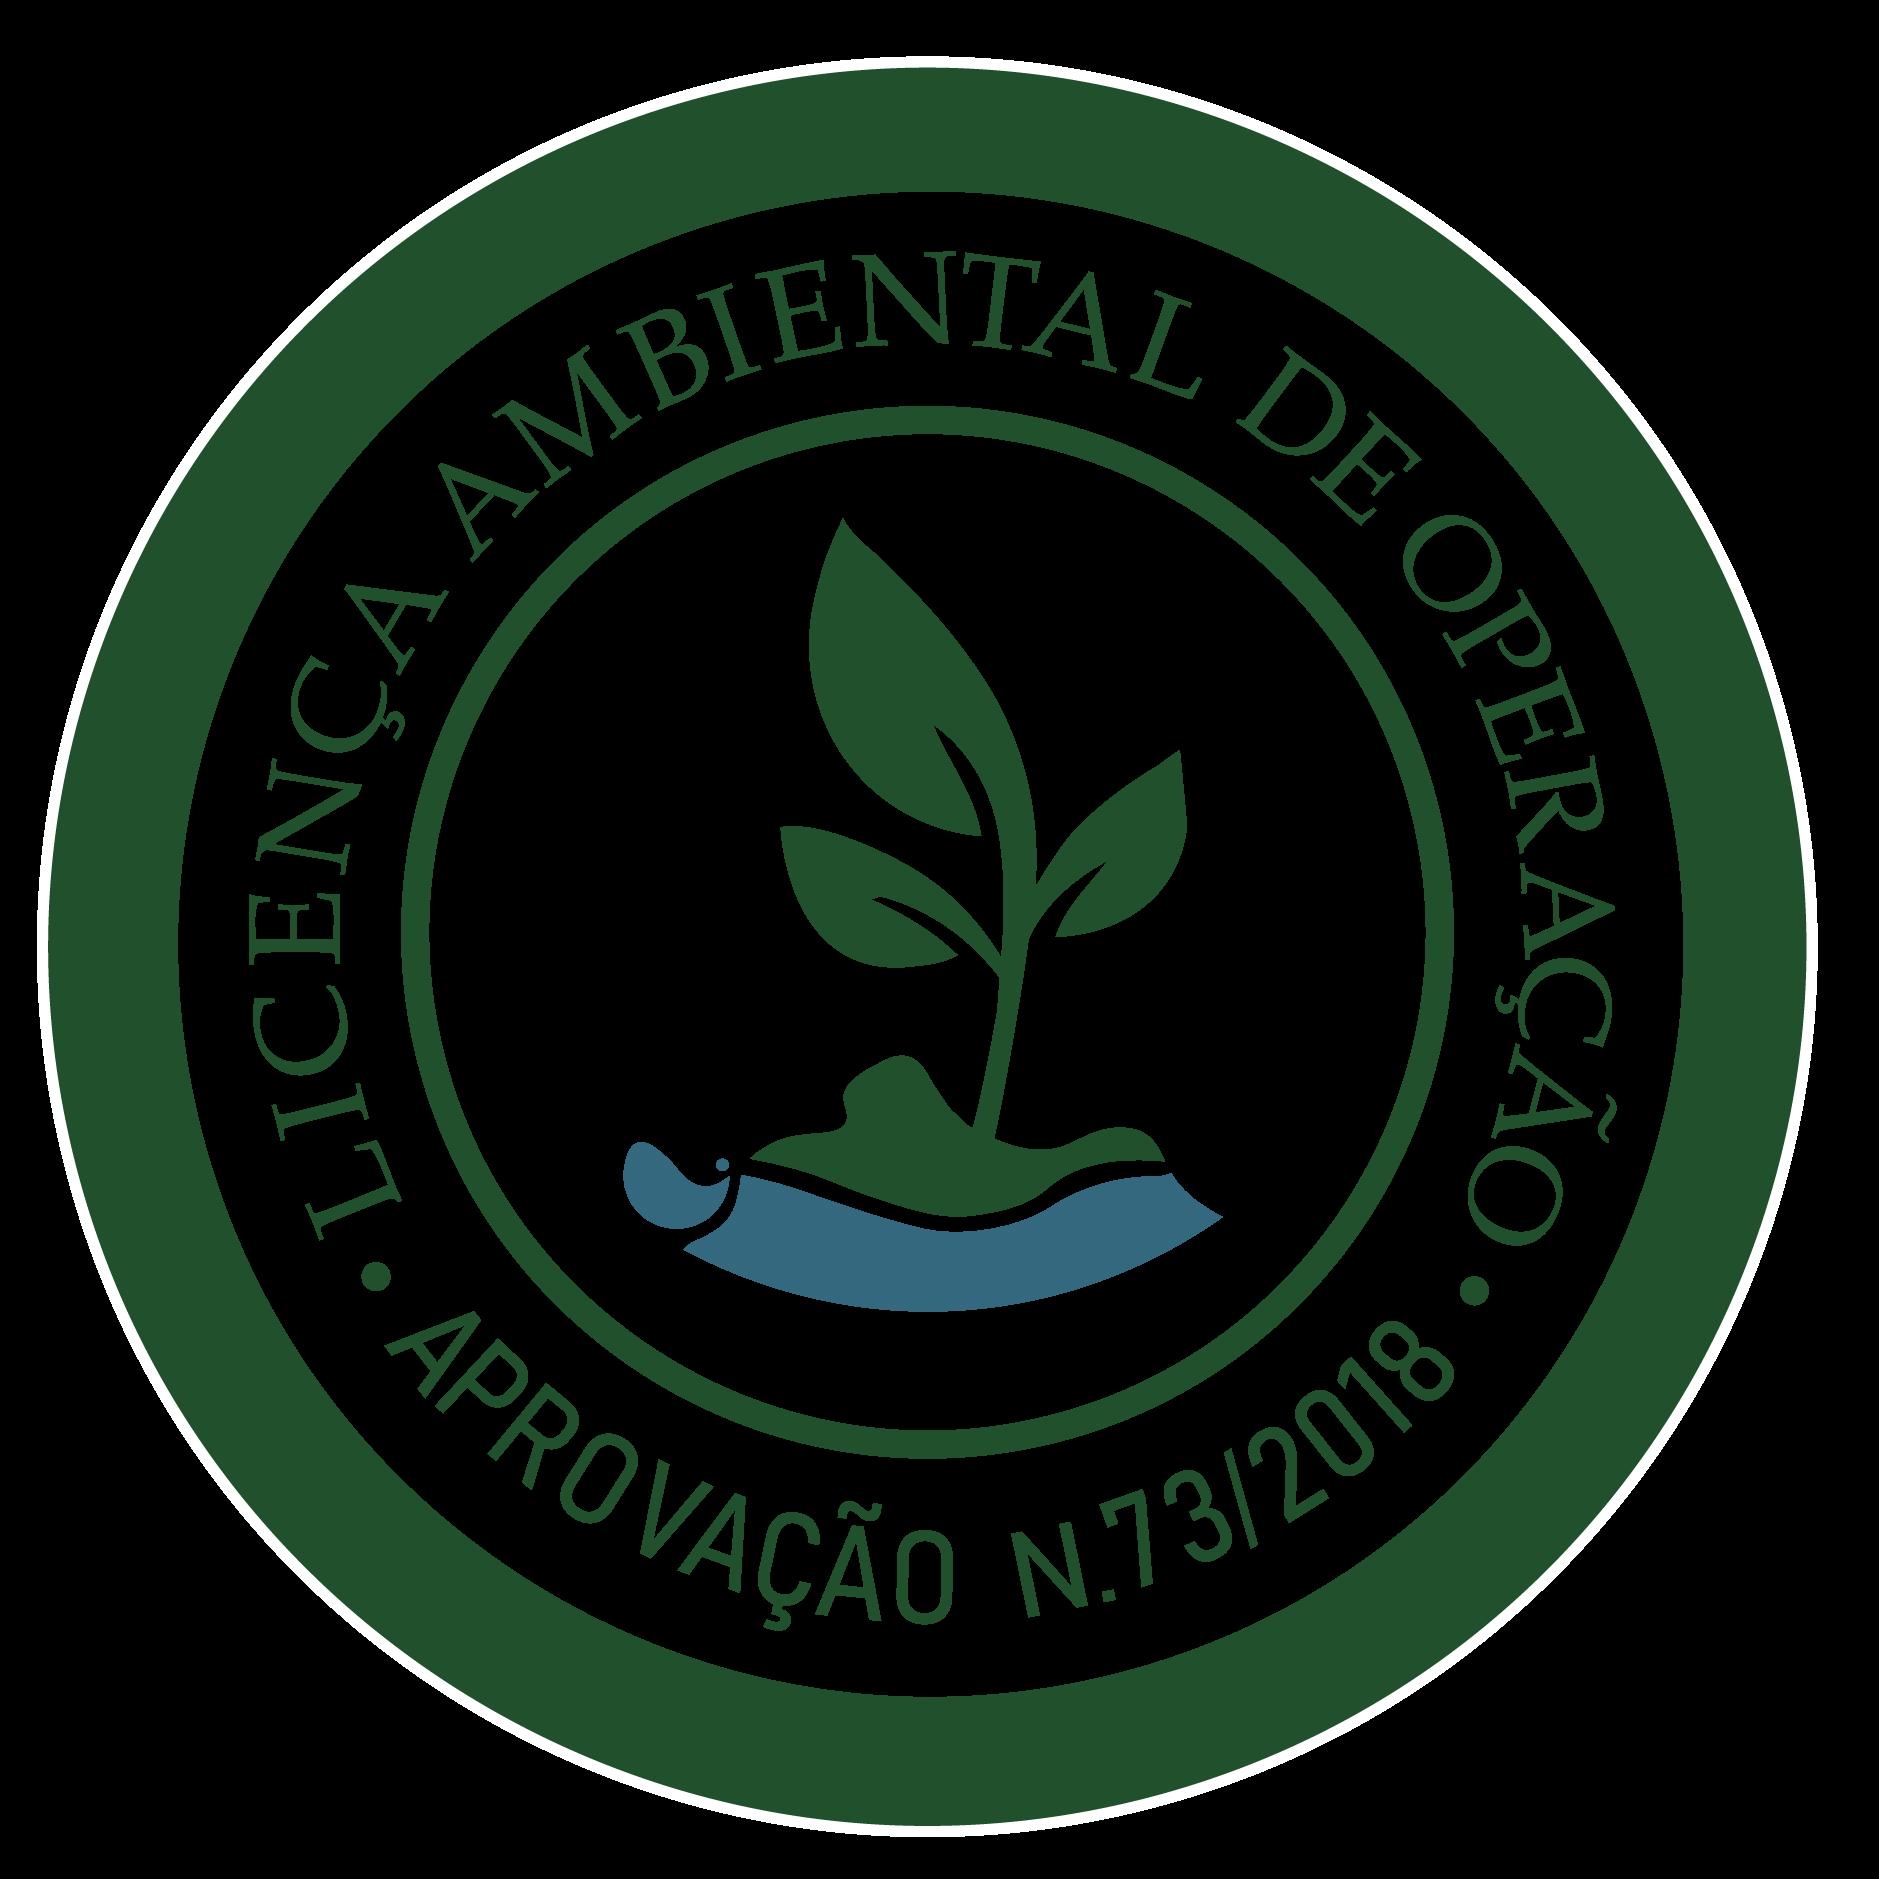 Selo Licença Ambiental